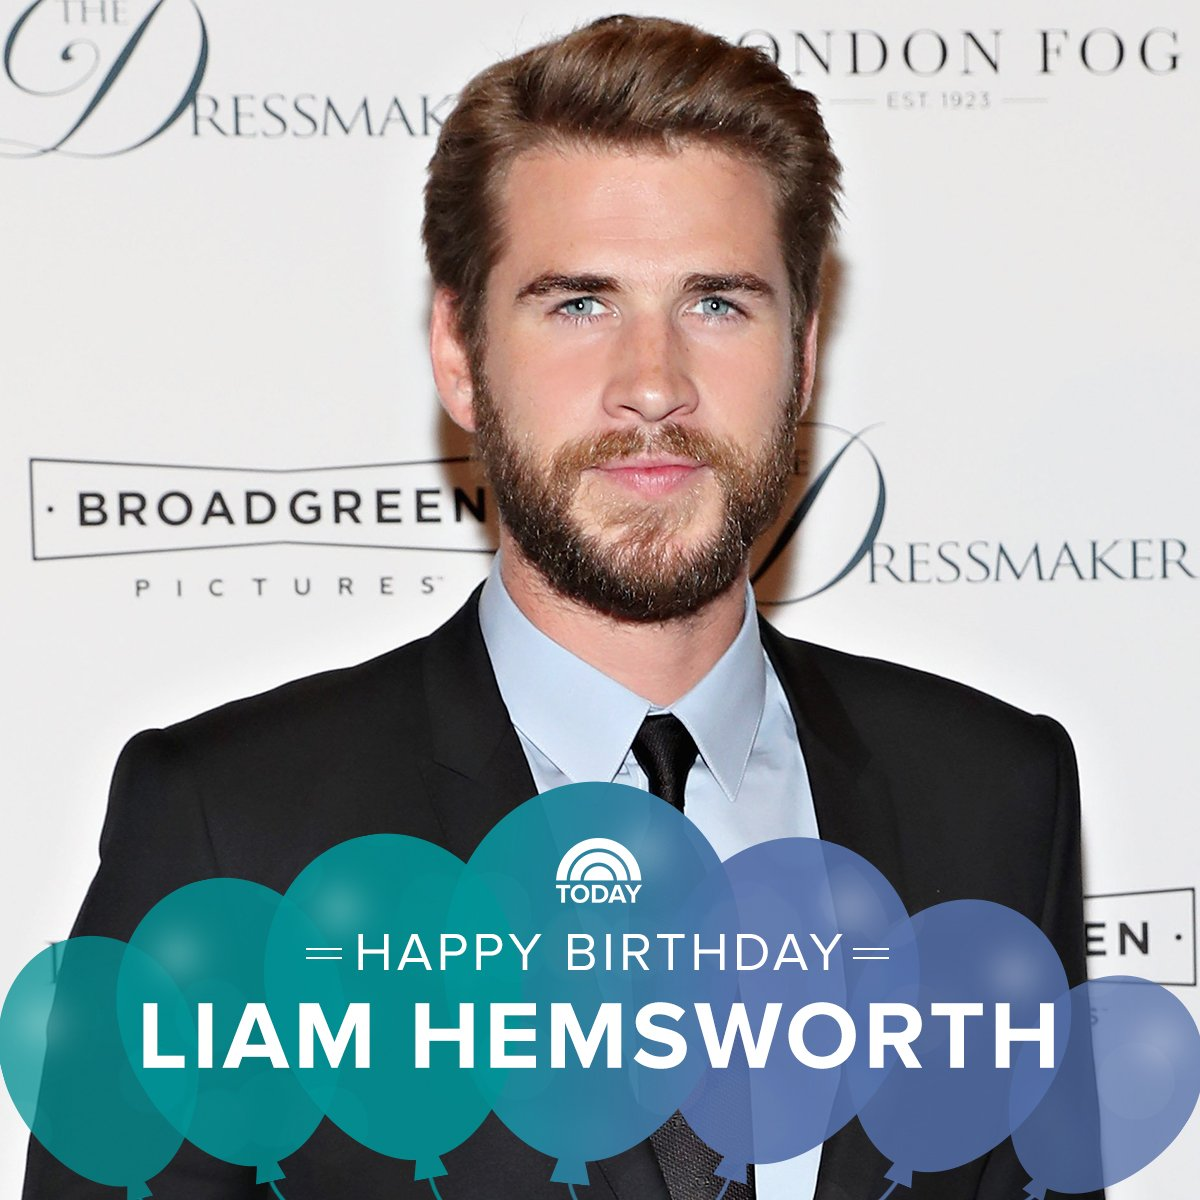 Remessageed TODAY ( Happy birthday, Liam Hemsworth!